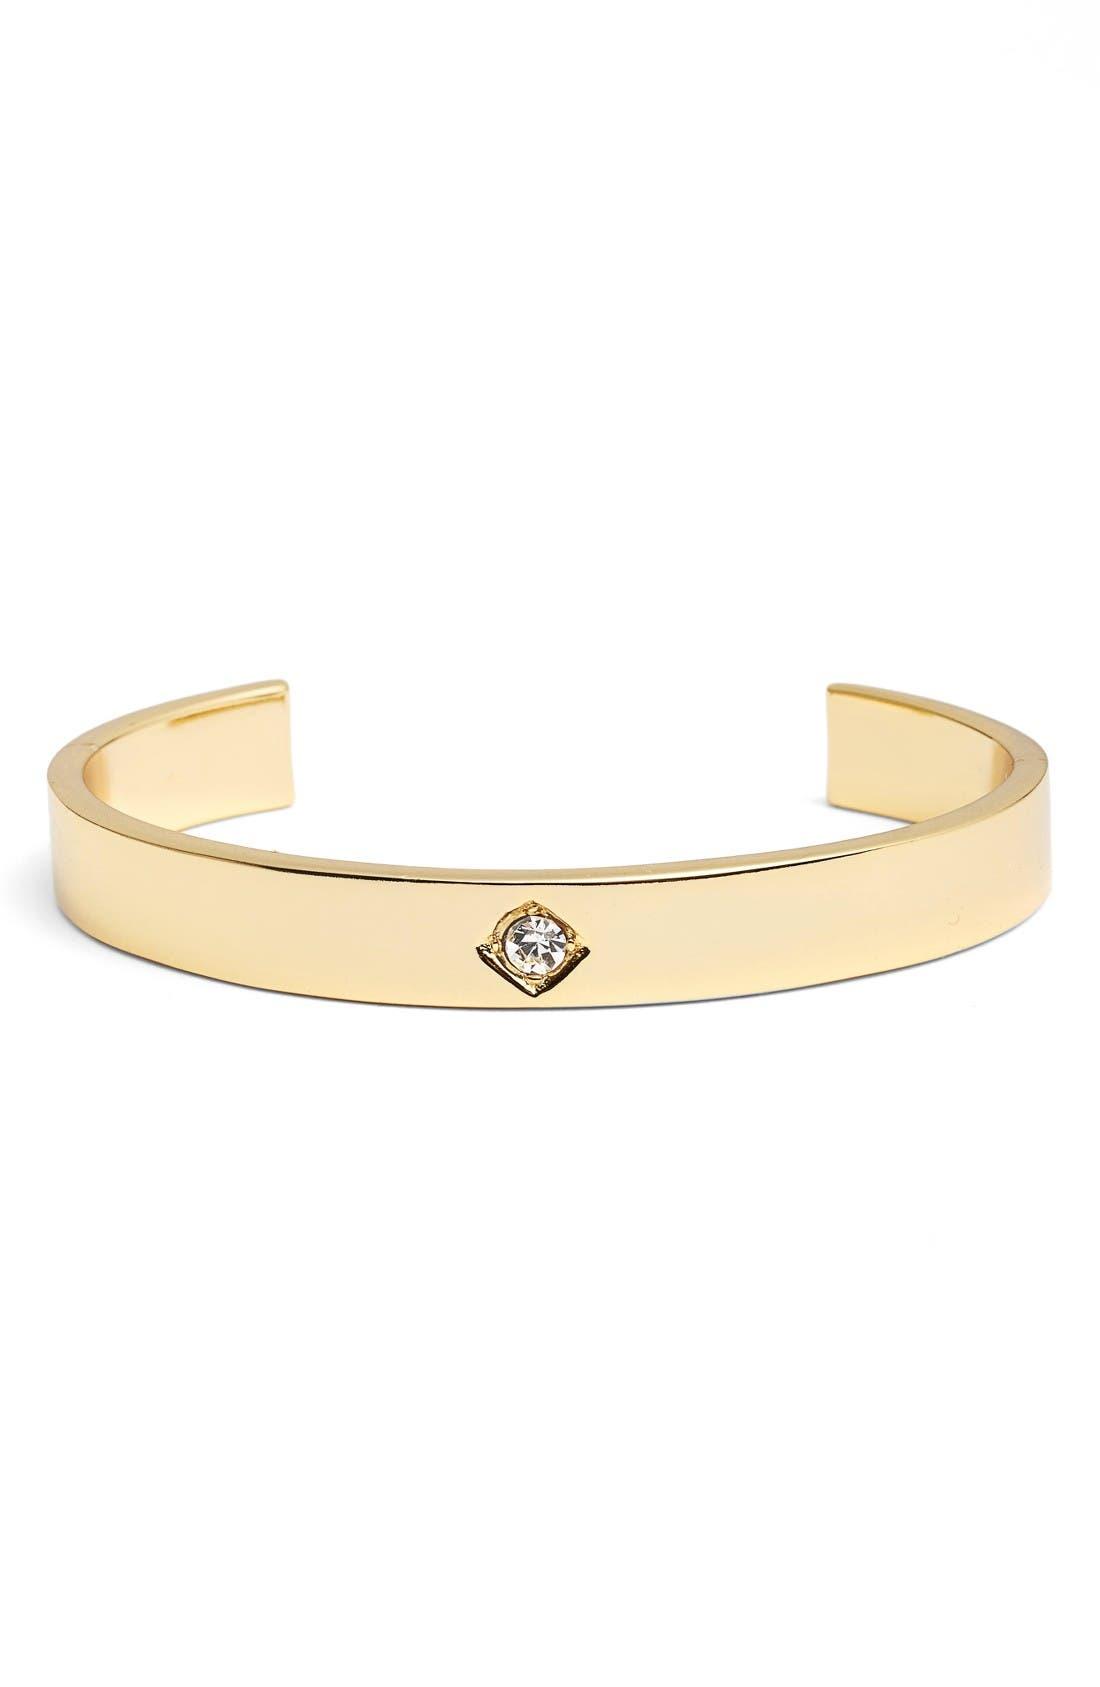 Jules Smith Tulum Cuff Bracelet